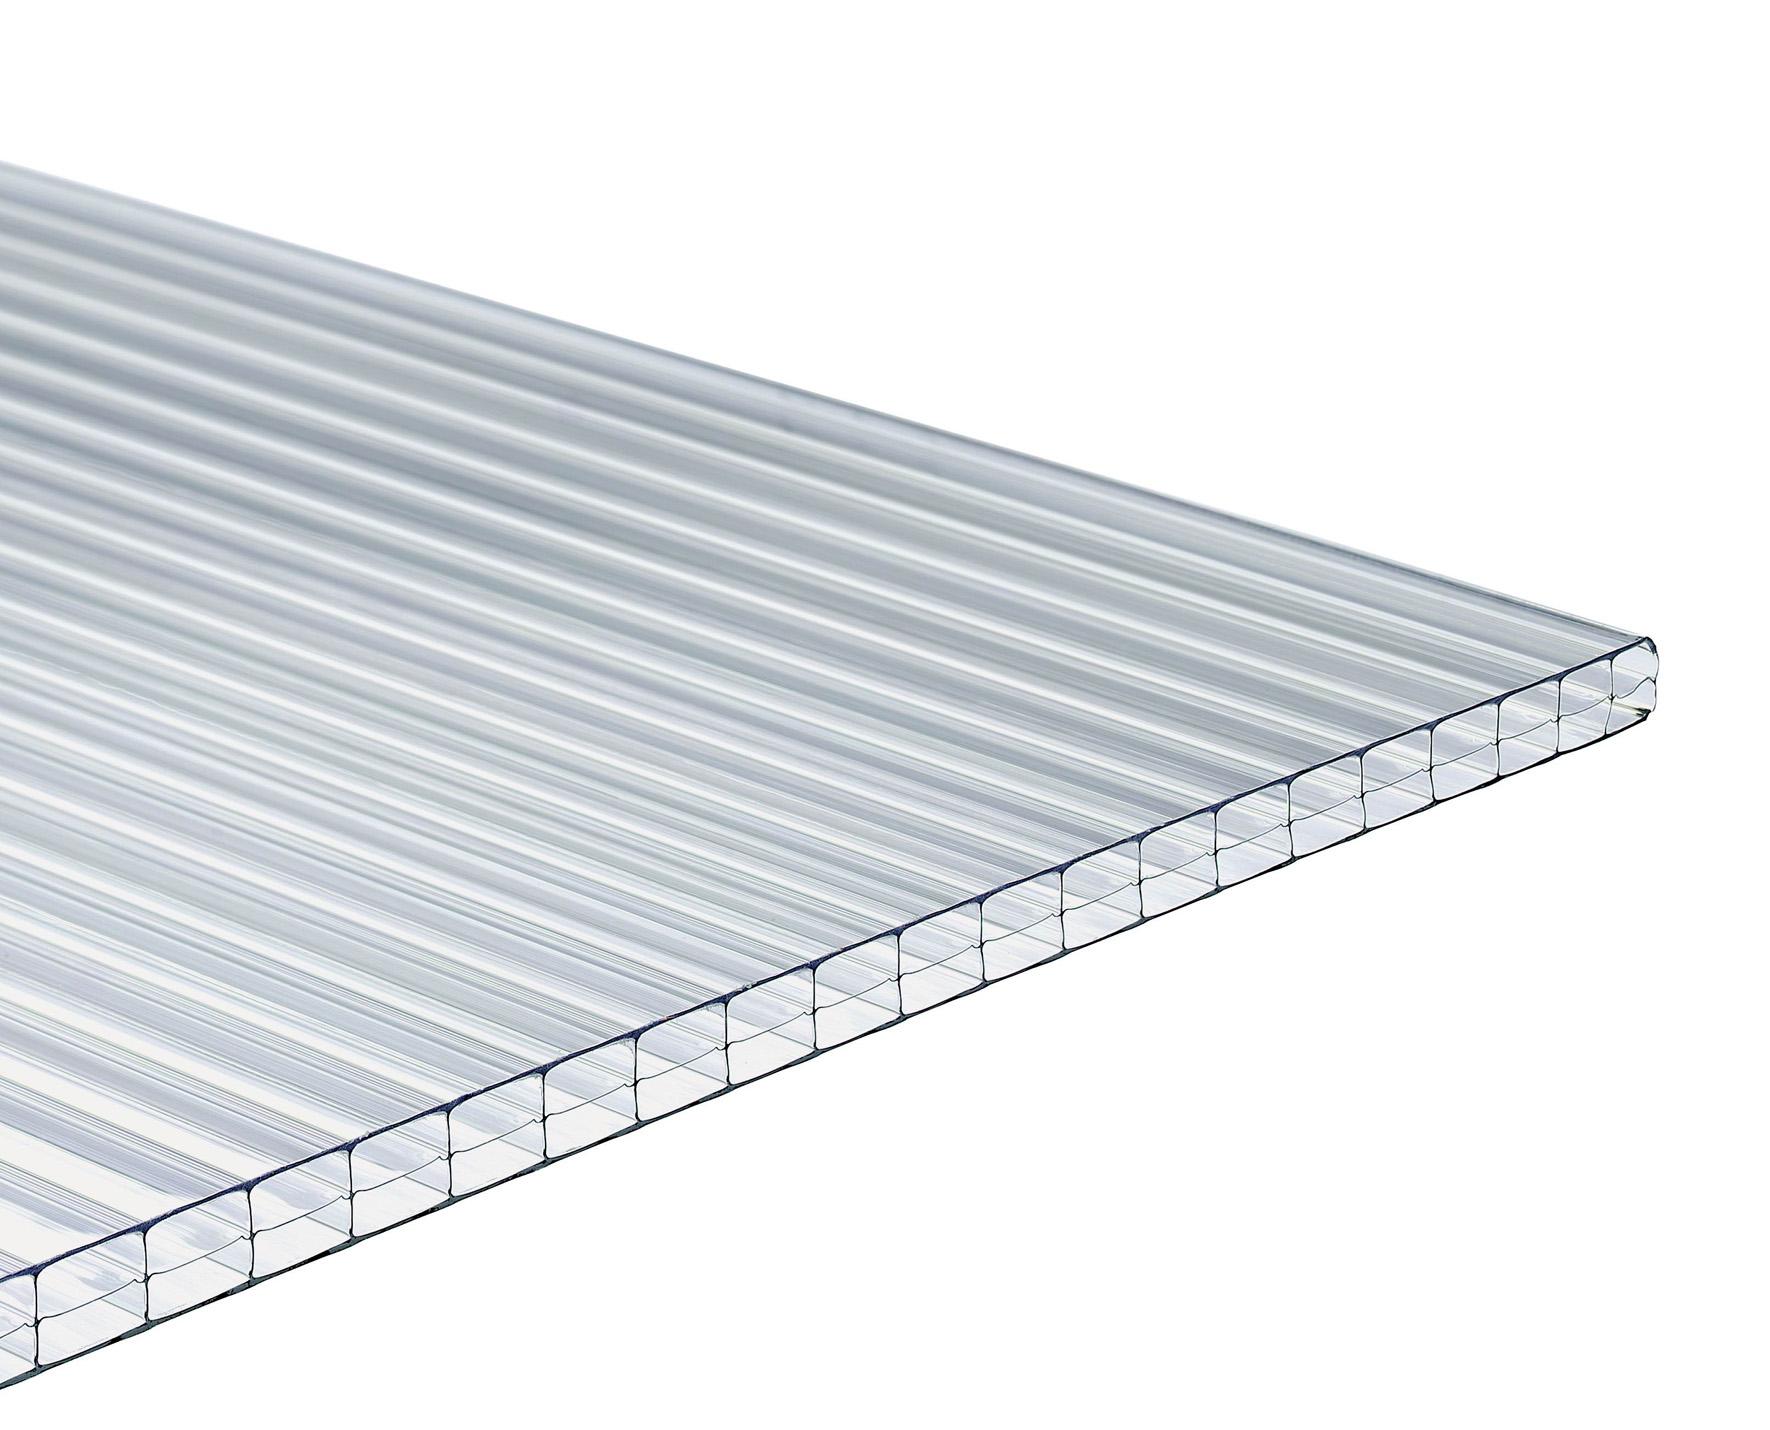 plaque polycarbonate lumisol 4 mm transparent 2 m. Black Bedroom Furniture Sets. Home Design Ideas